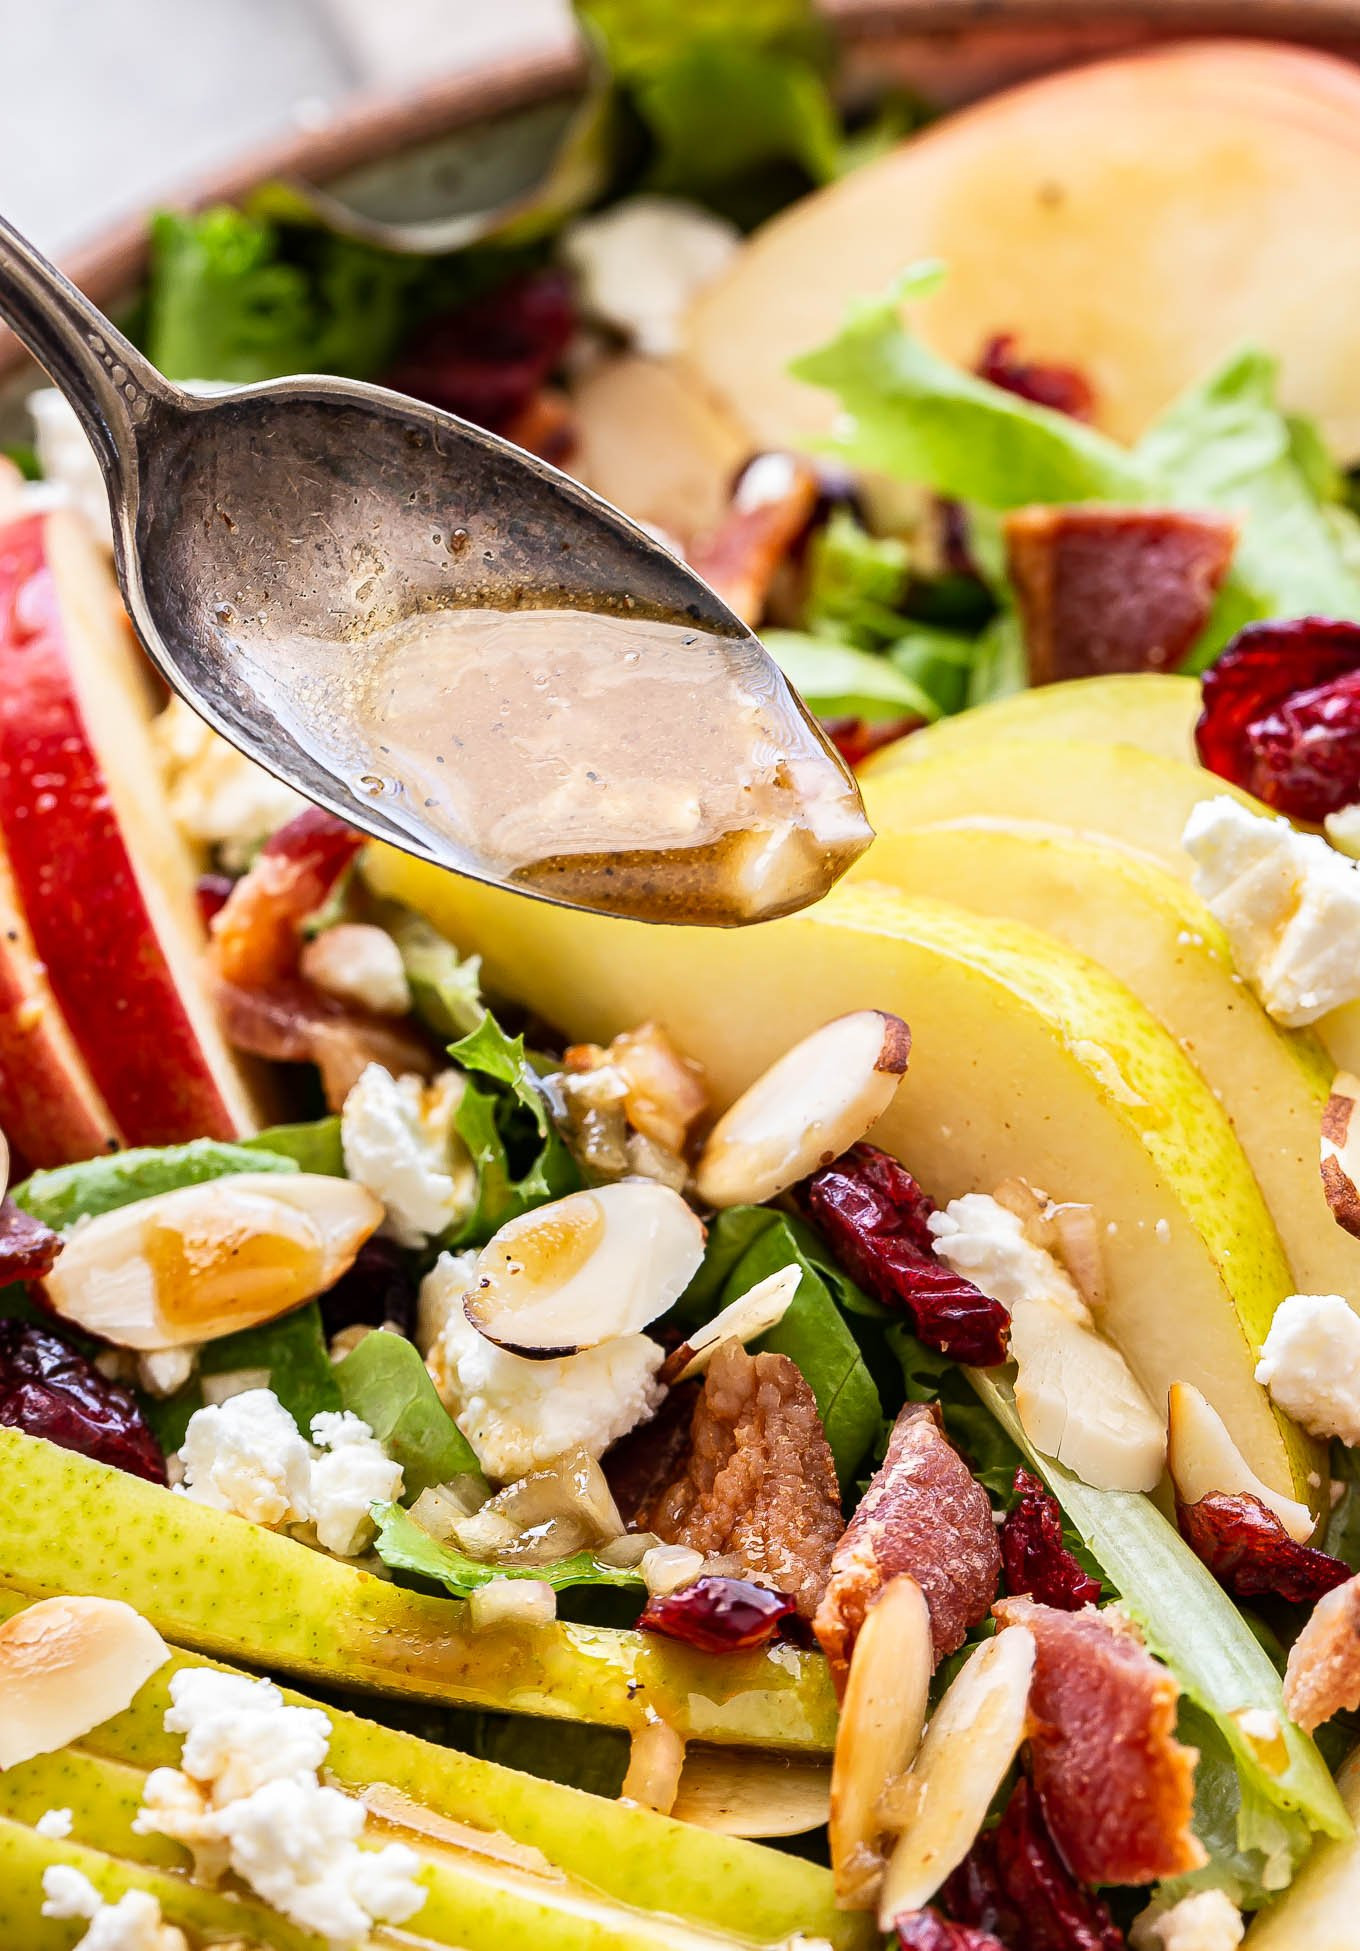 spoon pour vinaigrette over the Autumn Apple and Pear Salad